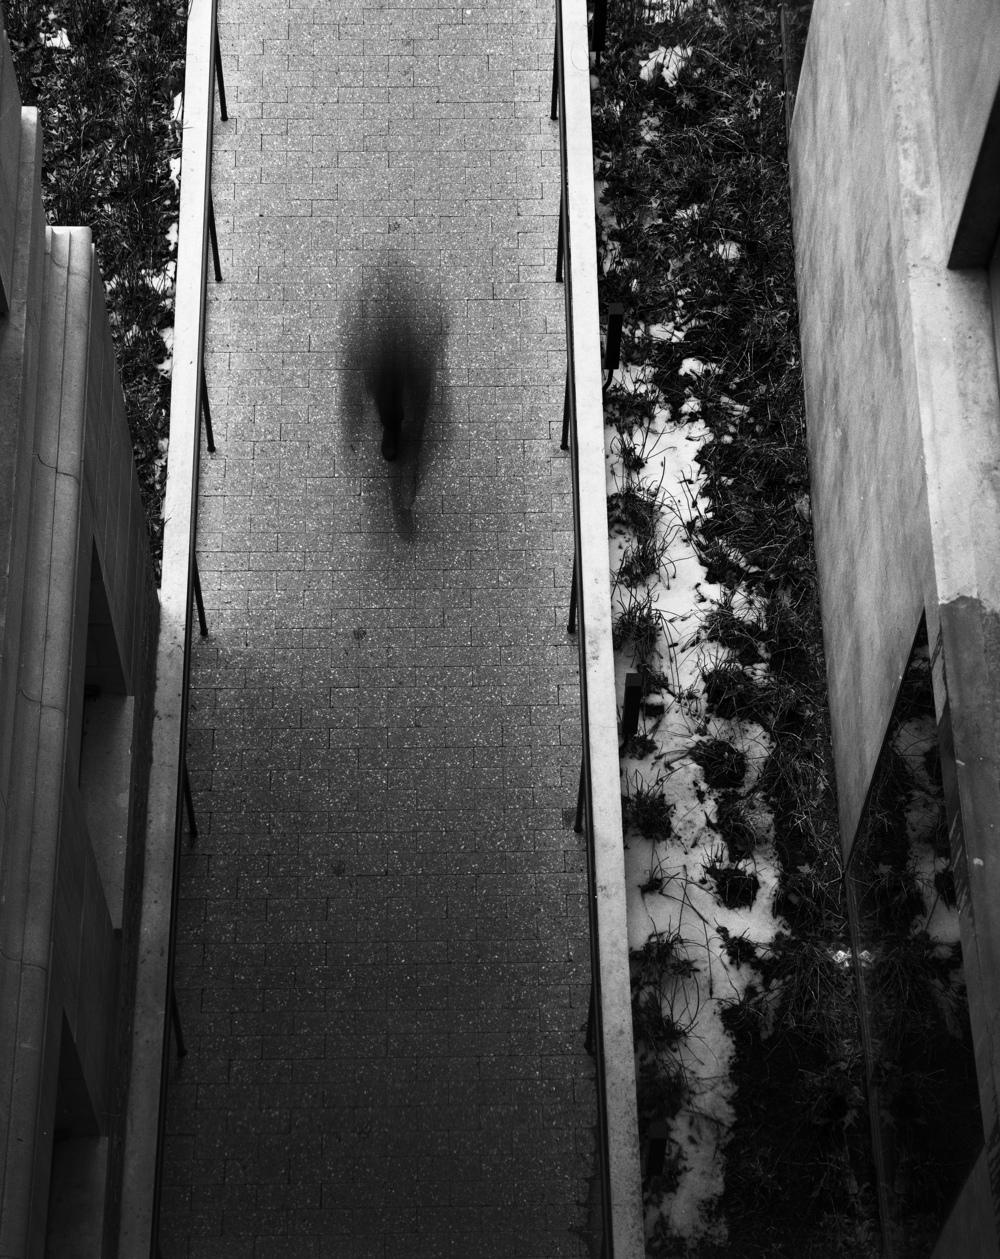 Untitled 1, 2014